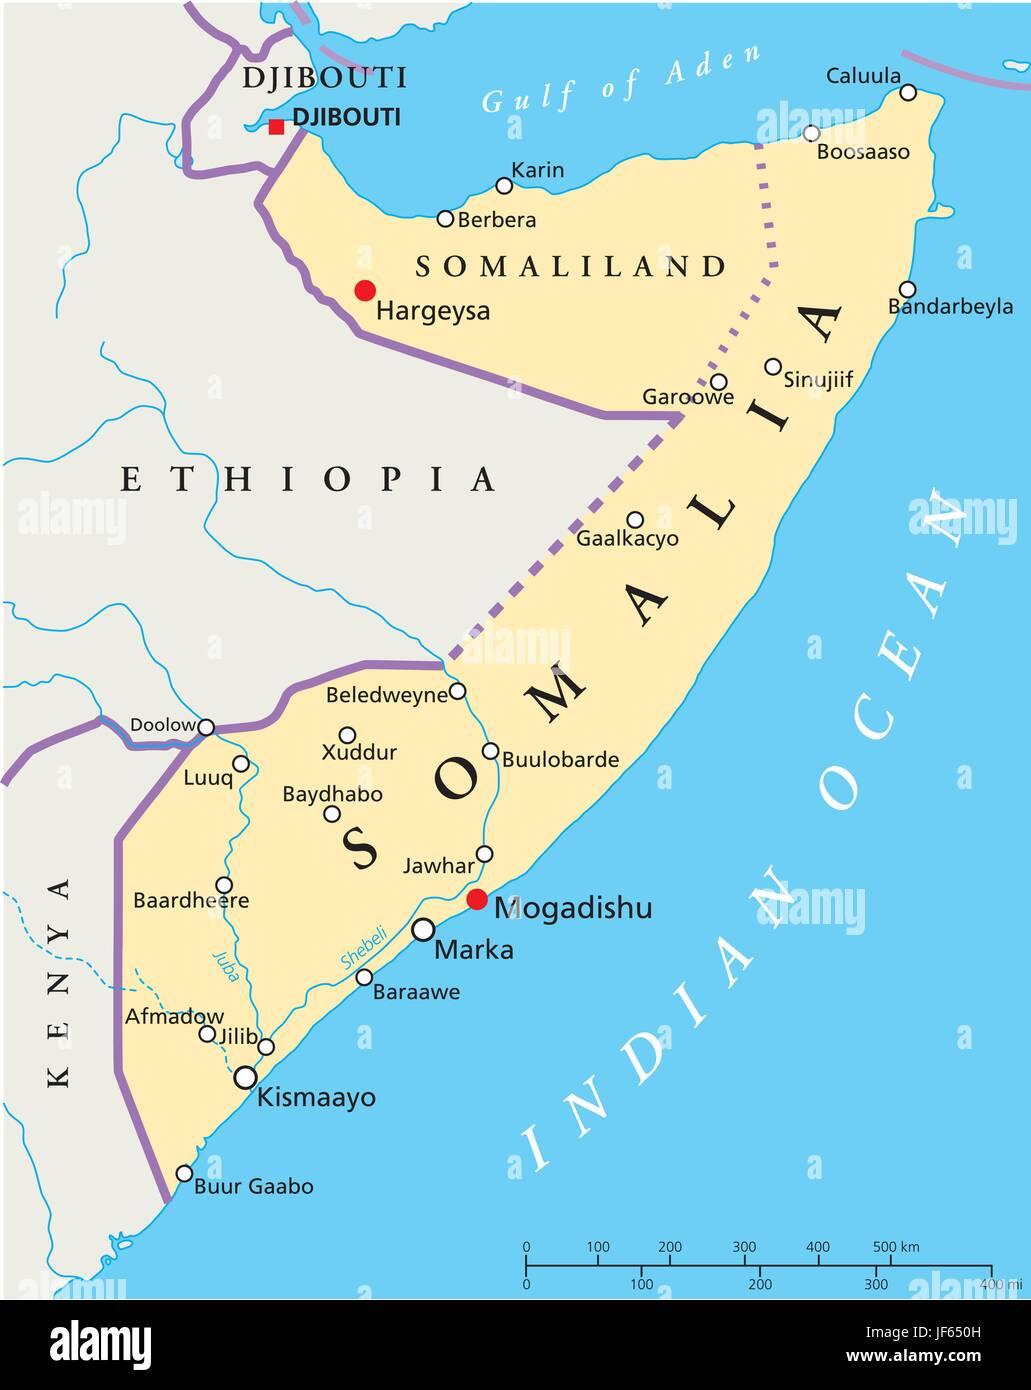 somalia map atlas map of the world africa kenya illustration